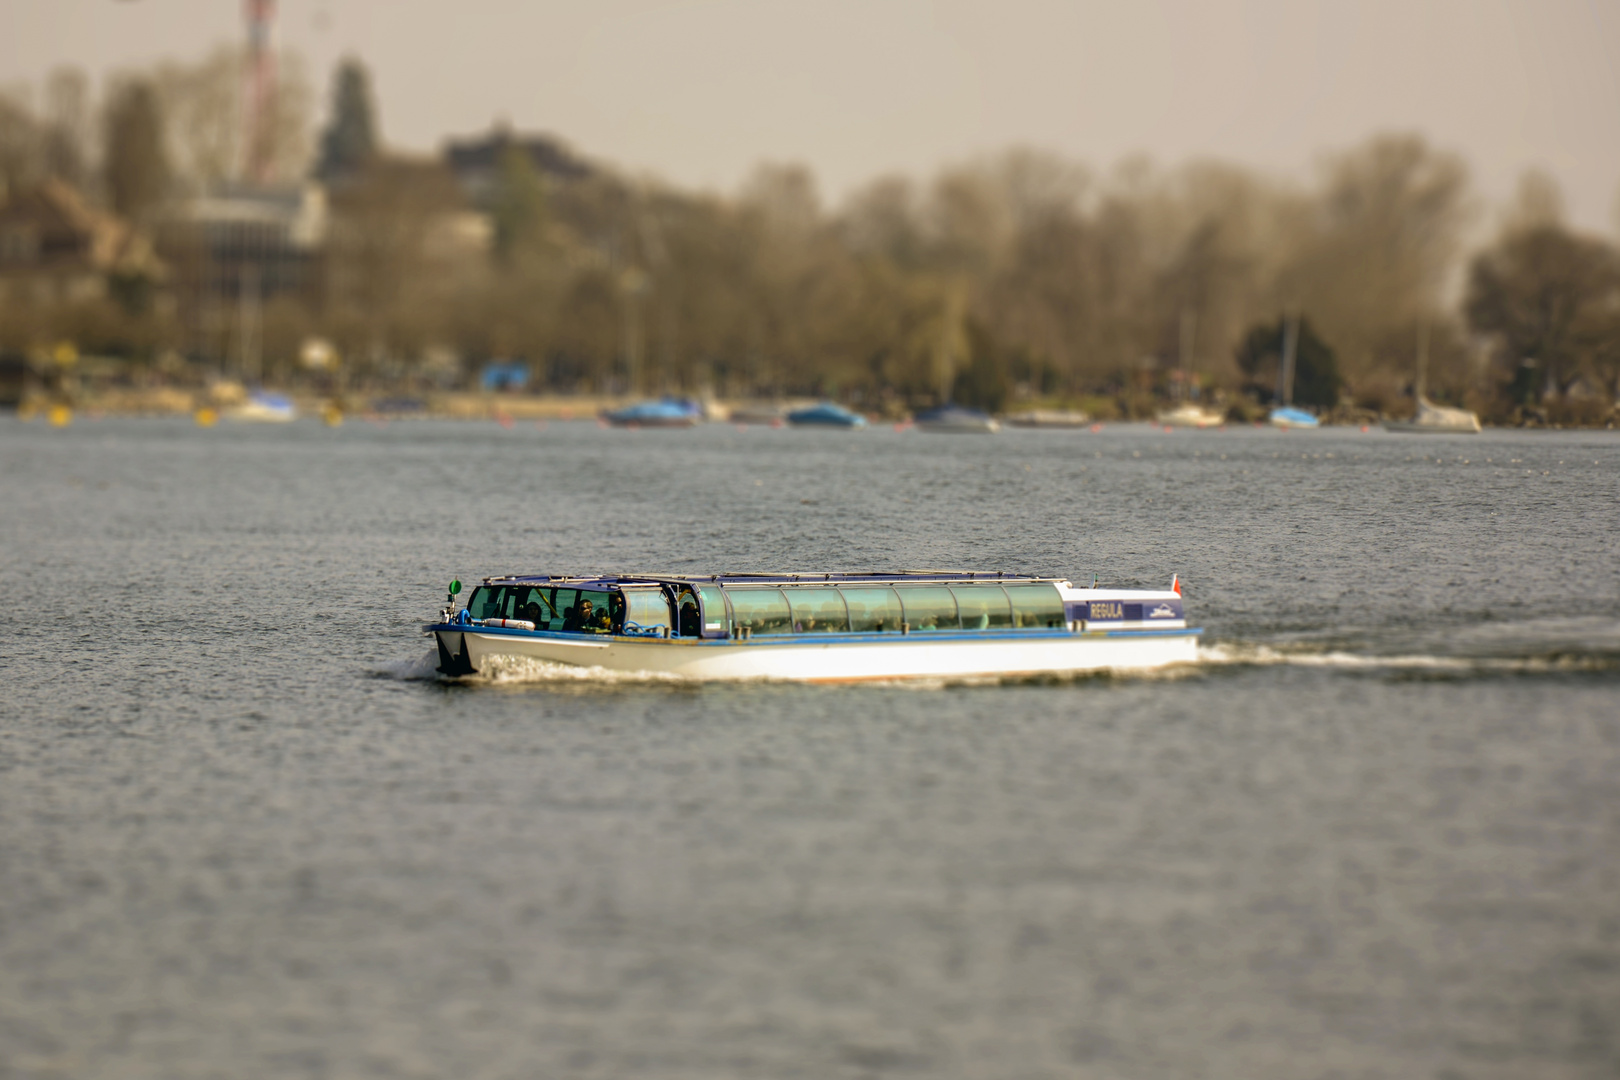 Limmatschiff